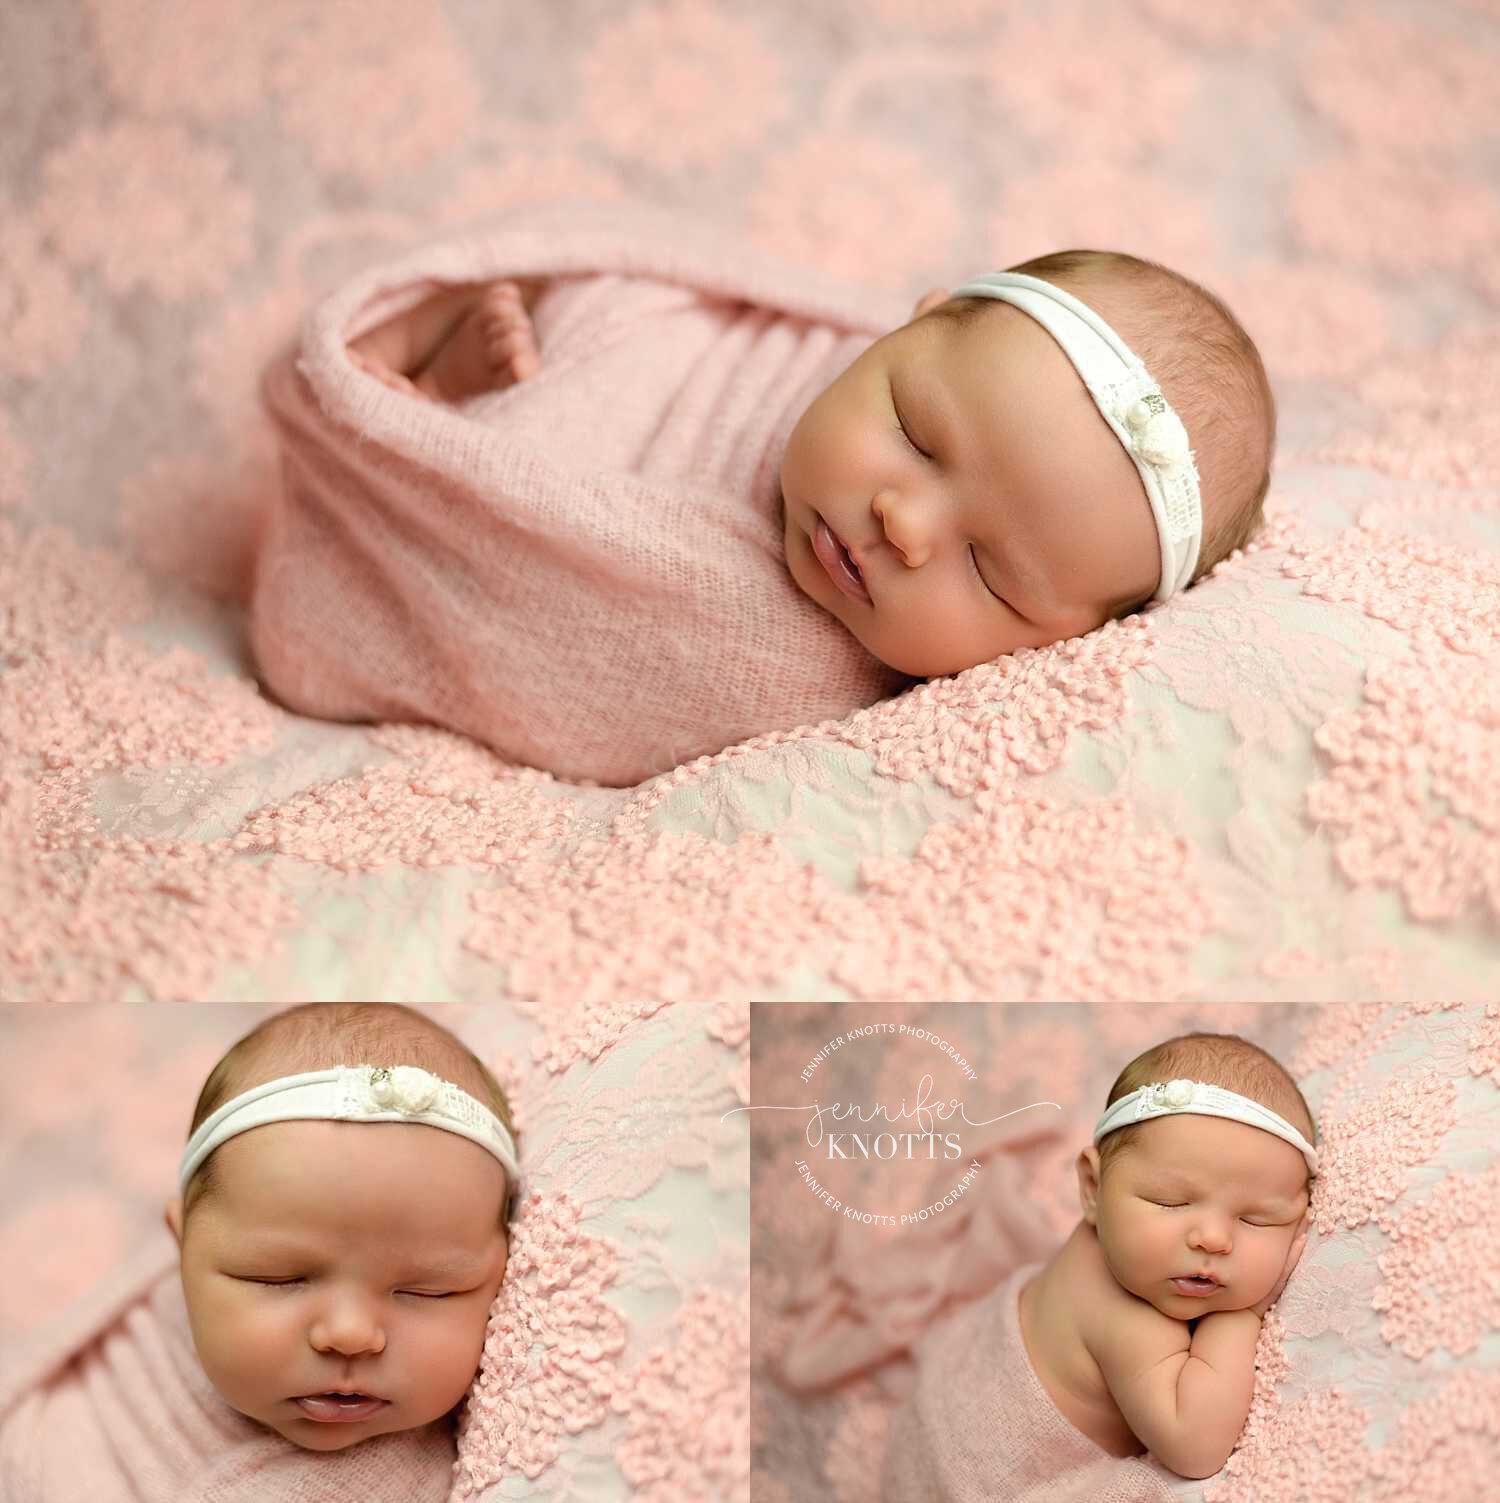 newborn sleeps on pink textured backdrop wearing white headband